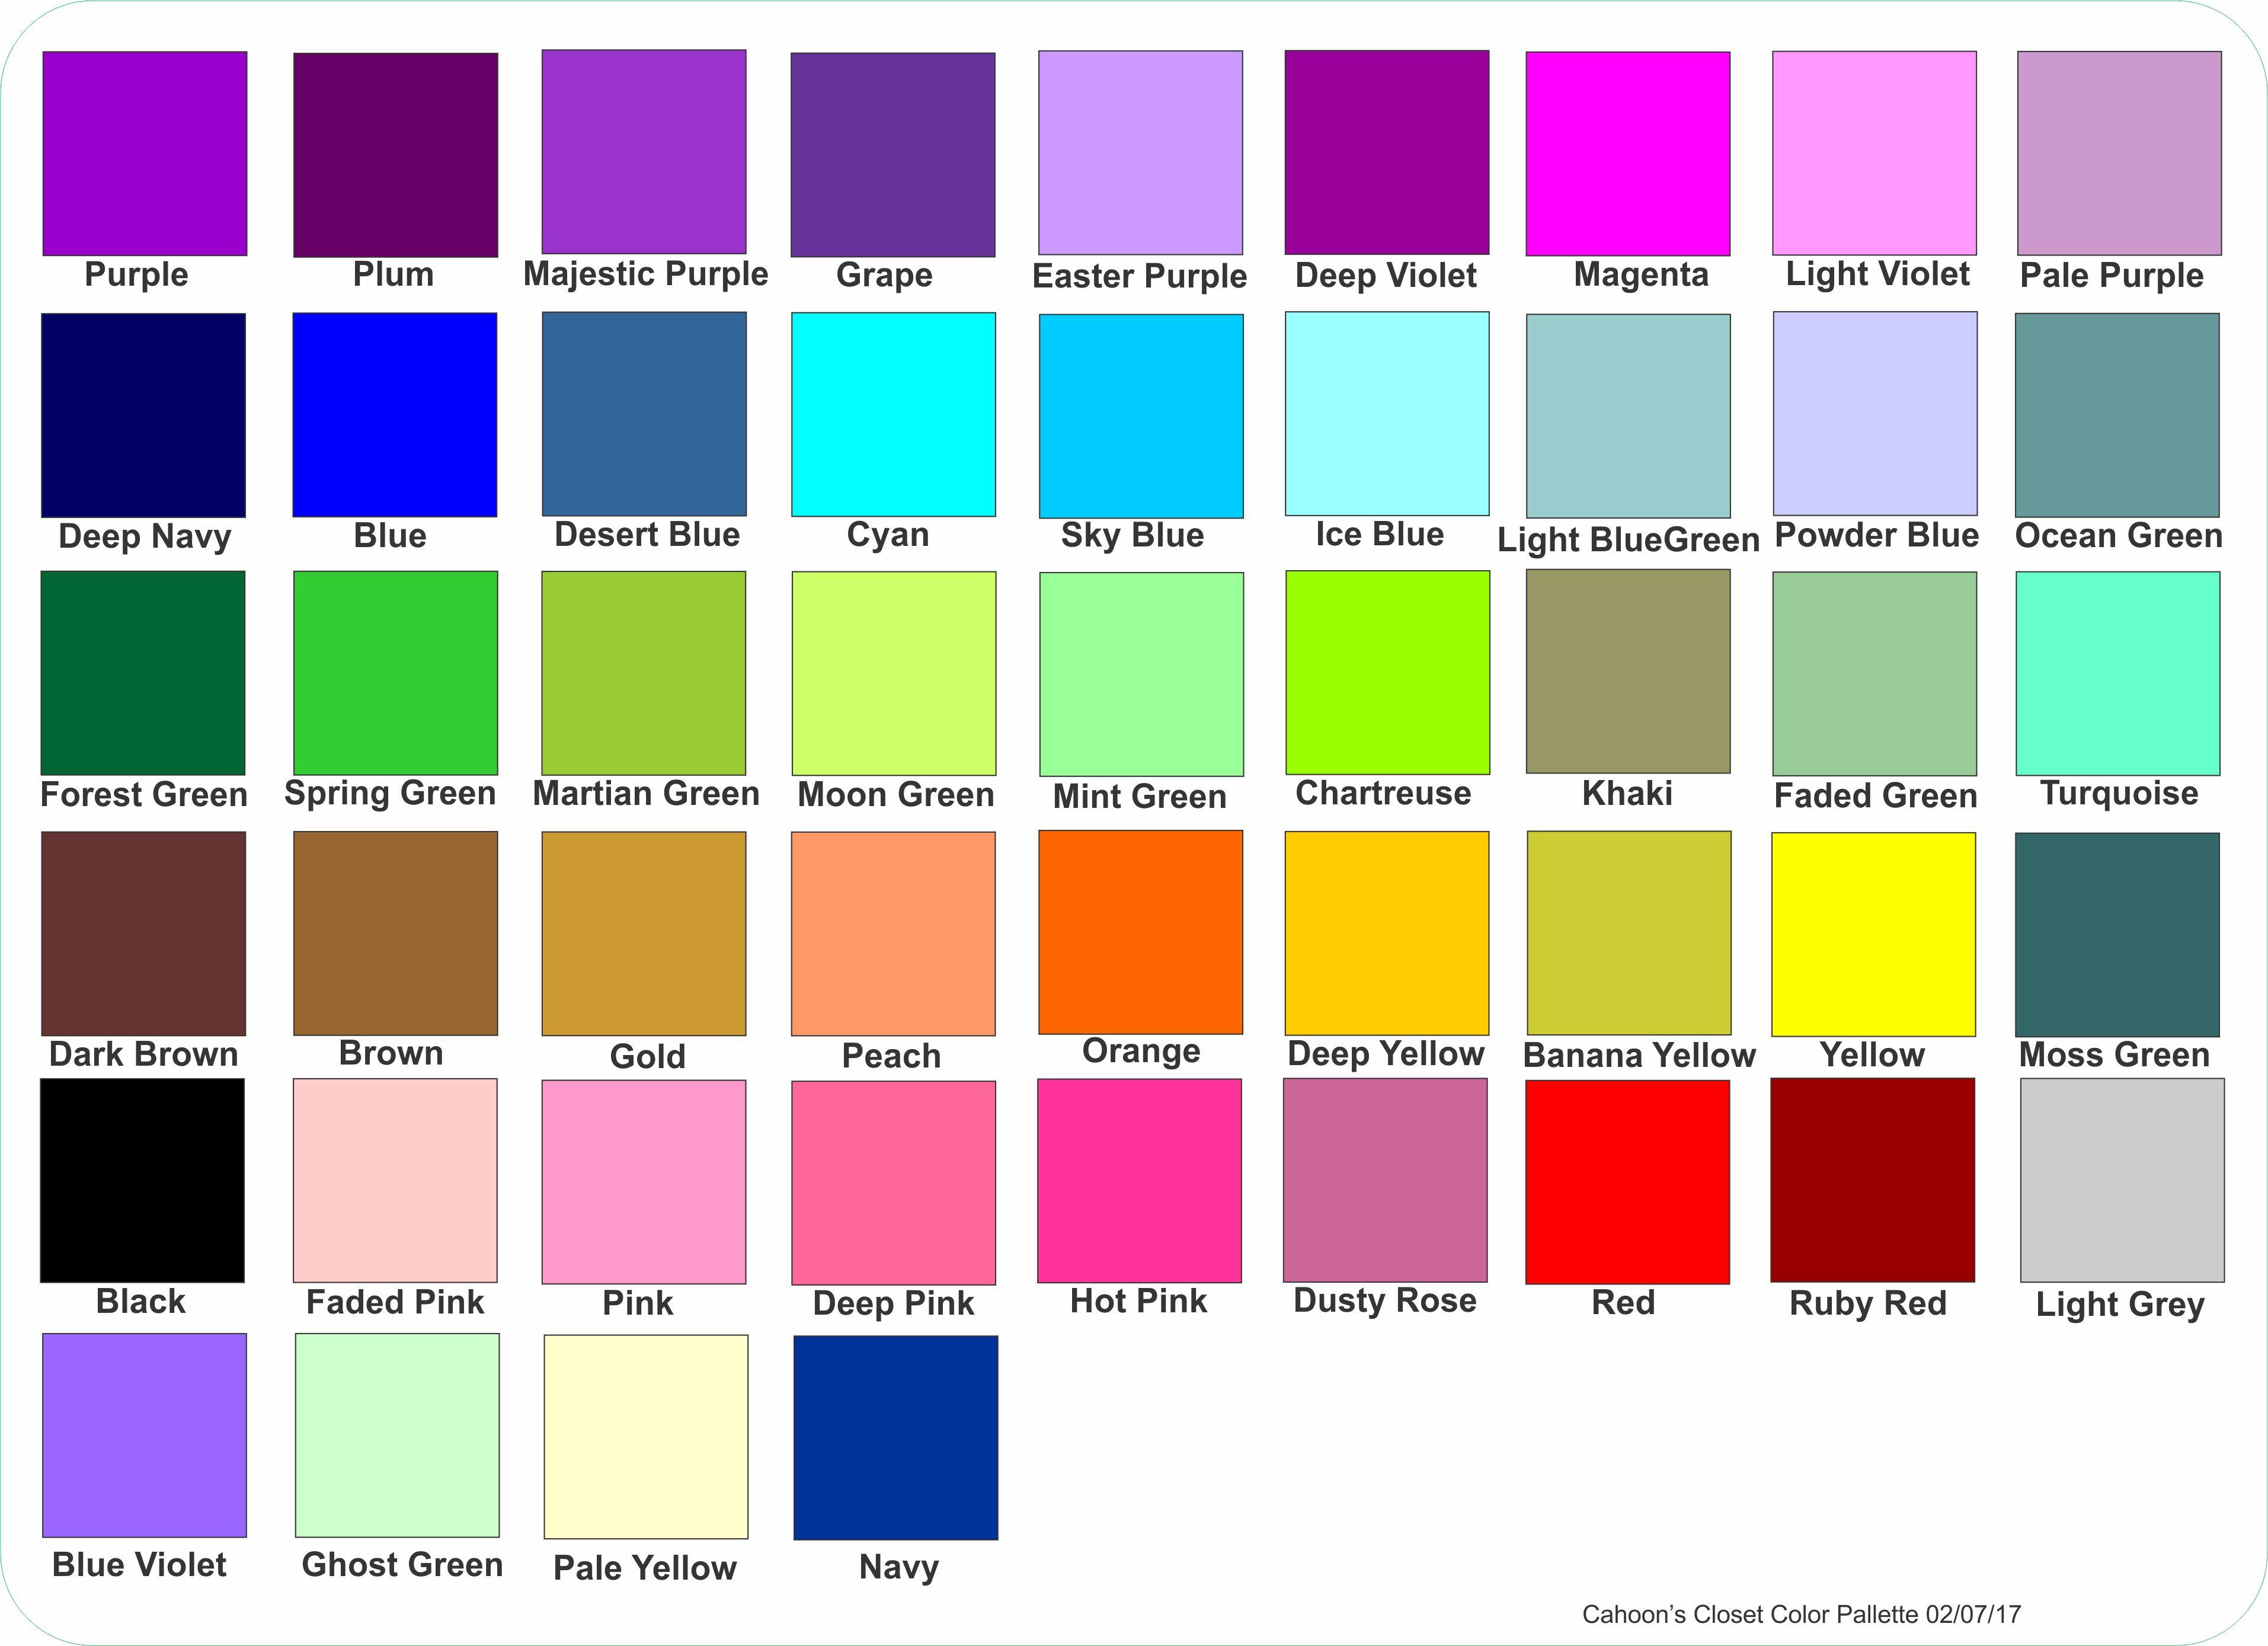 Purple Turtles Standard Color Pallet